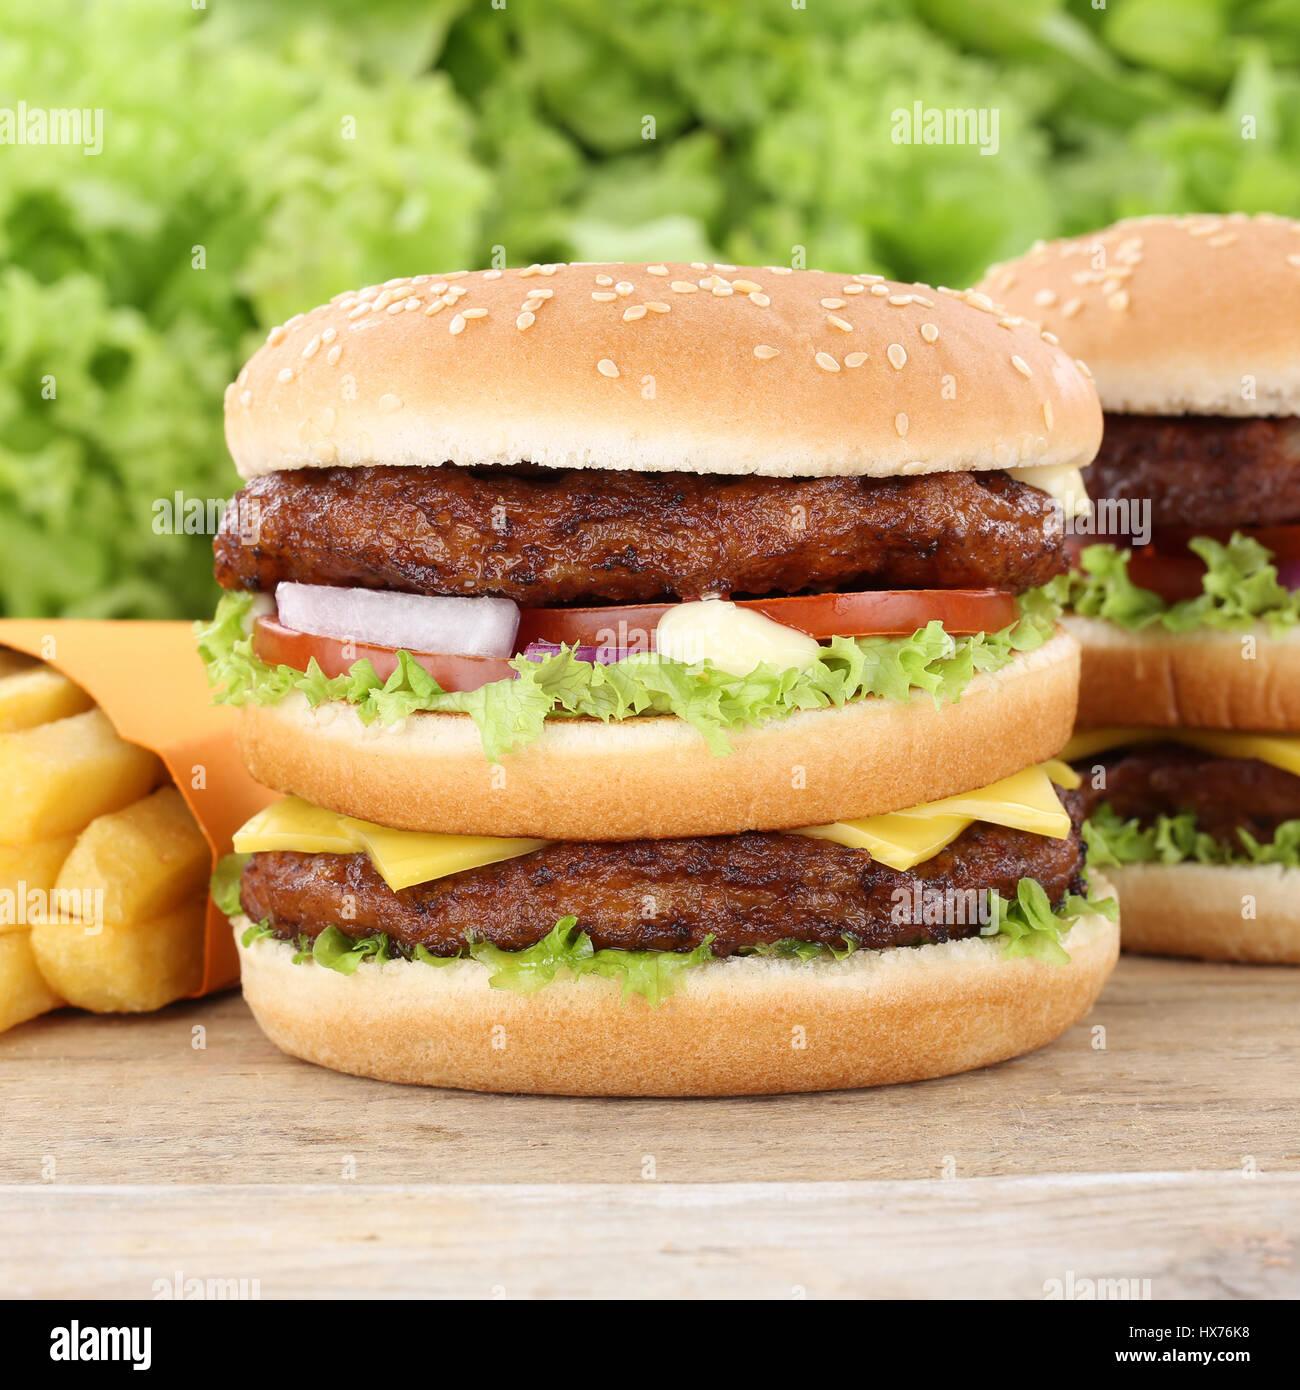 Double burger hamburger e patatine fritte pomodori lattuga fast food Immagini Stock